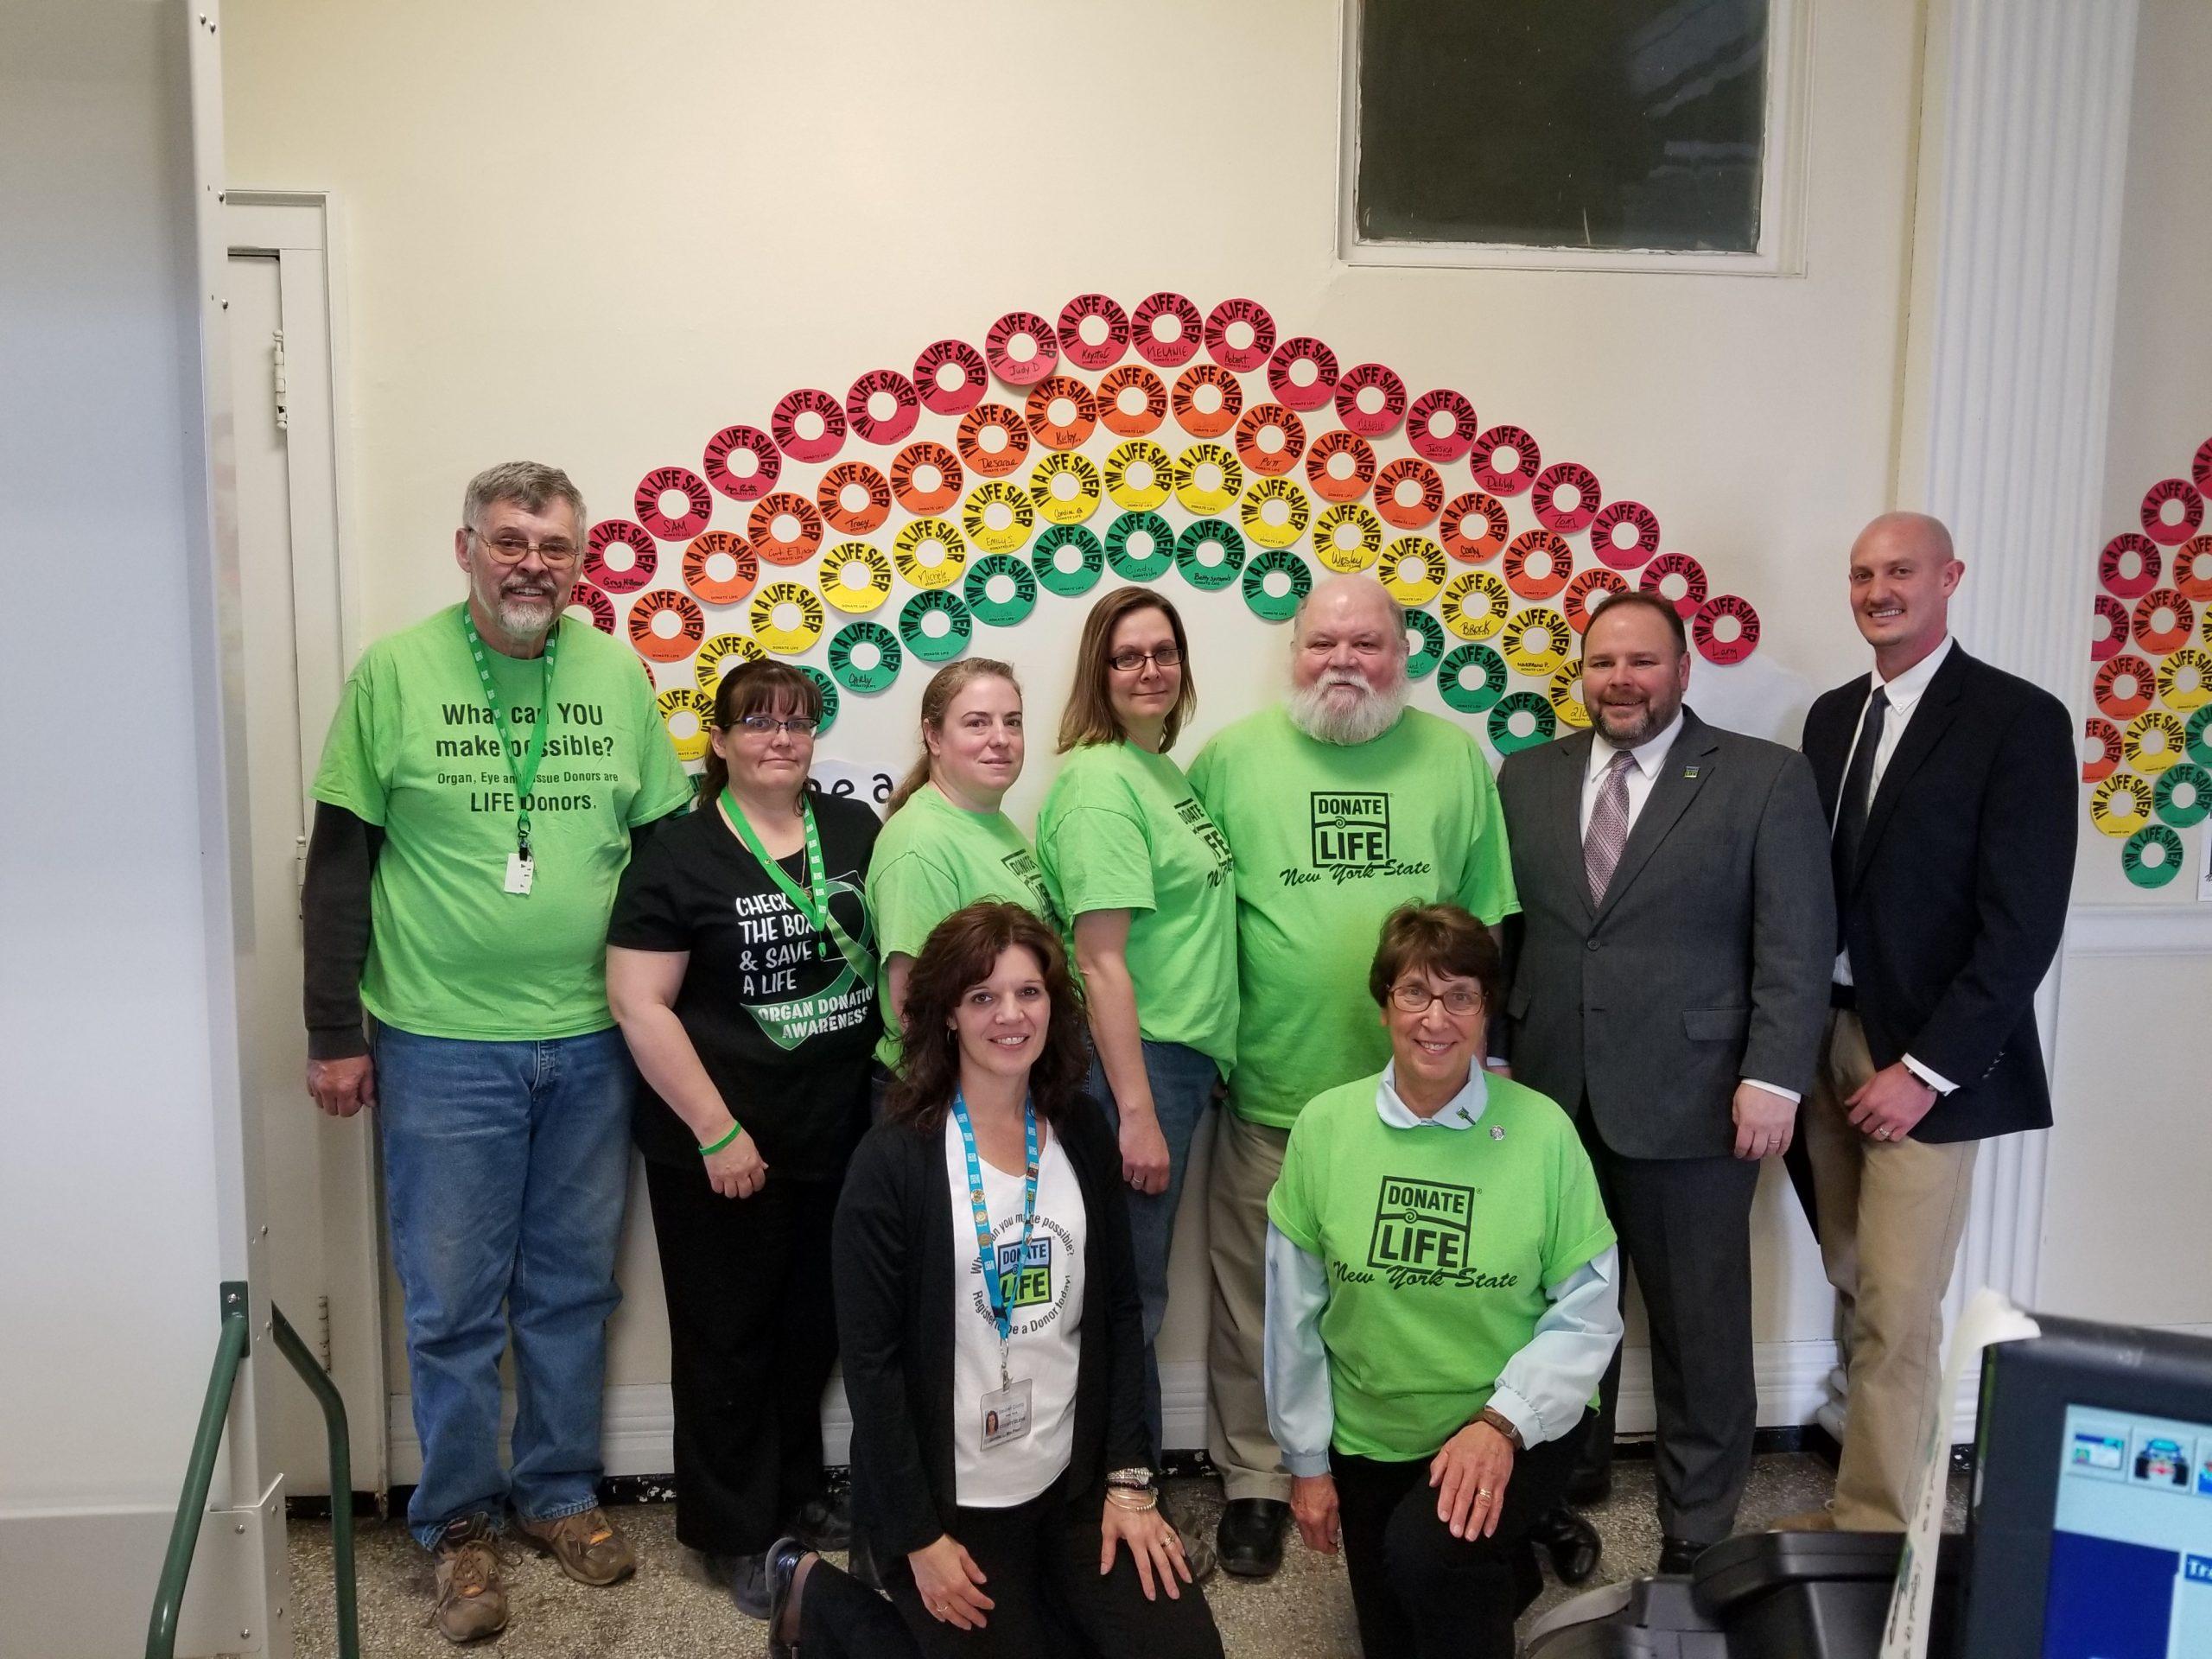 Palmesano, Steuben Co. Leaders Urge Organ Donation